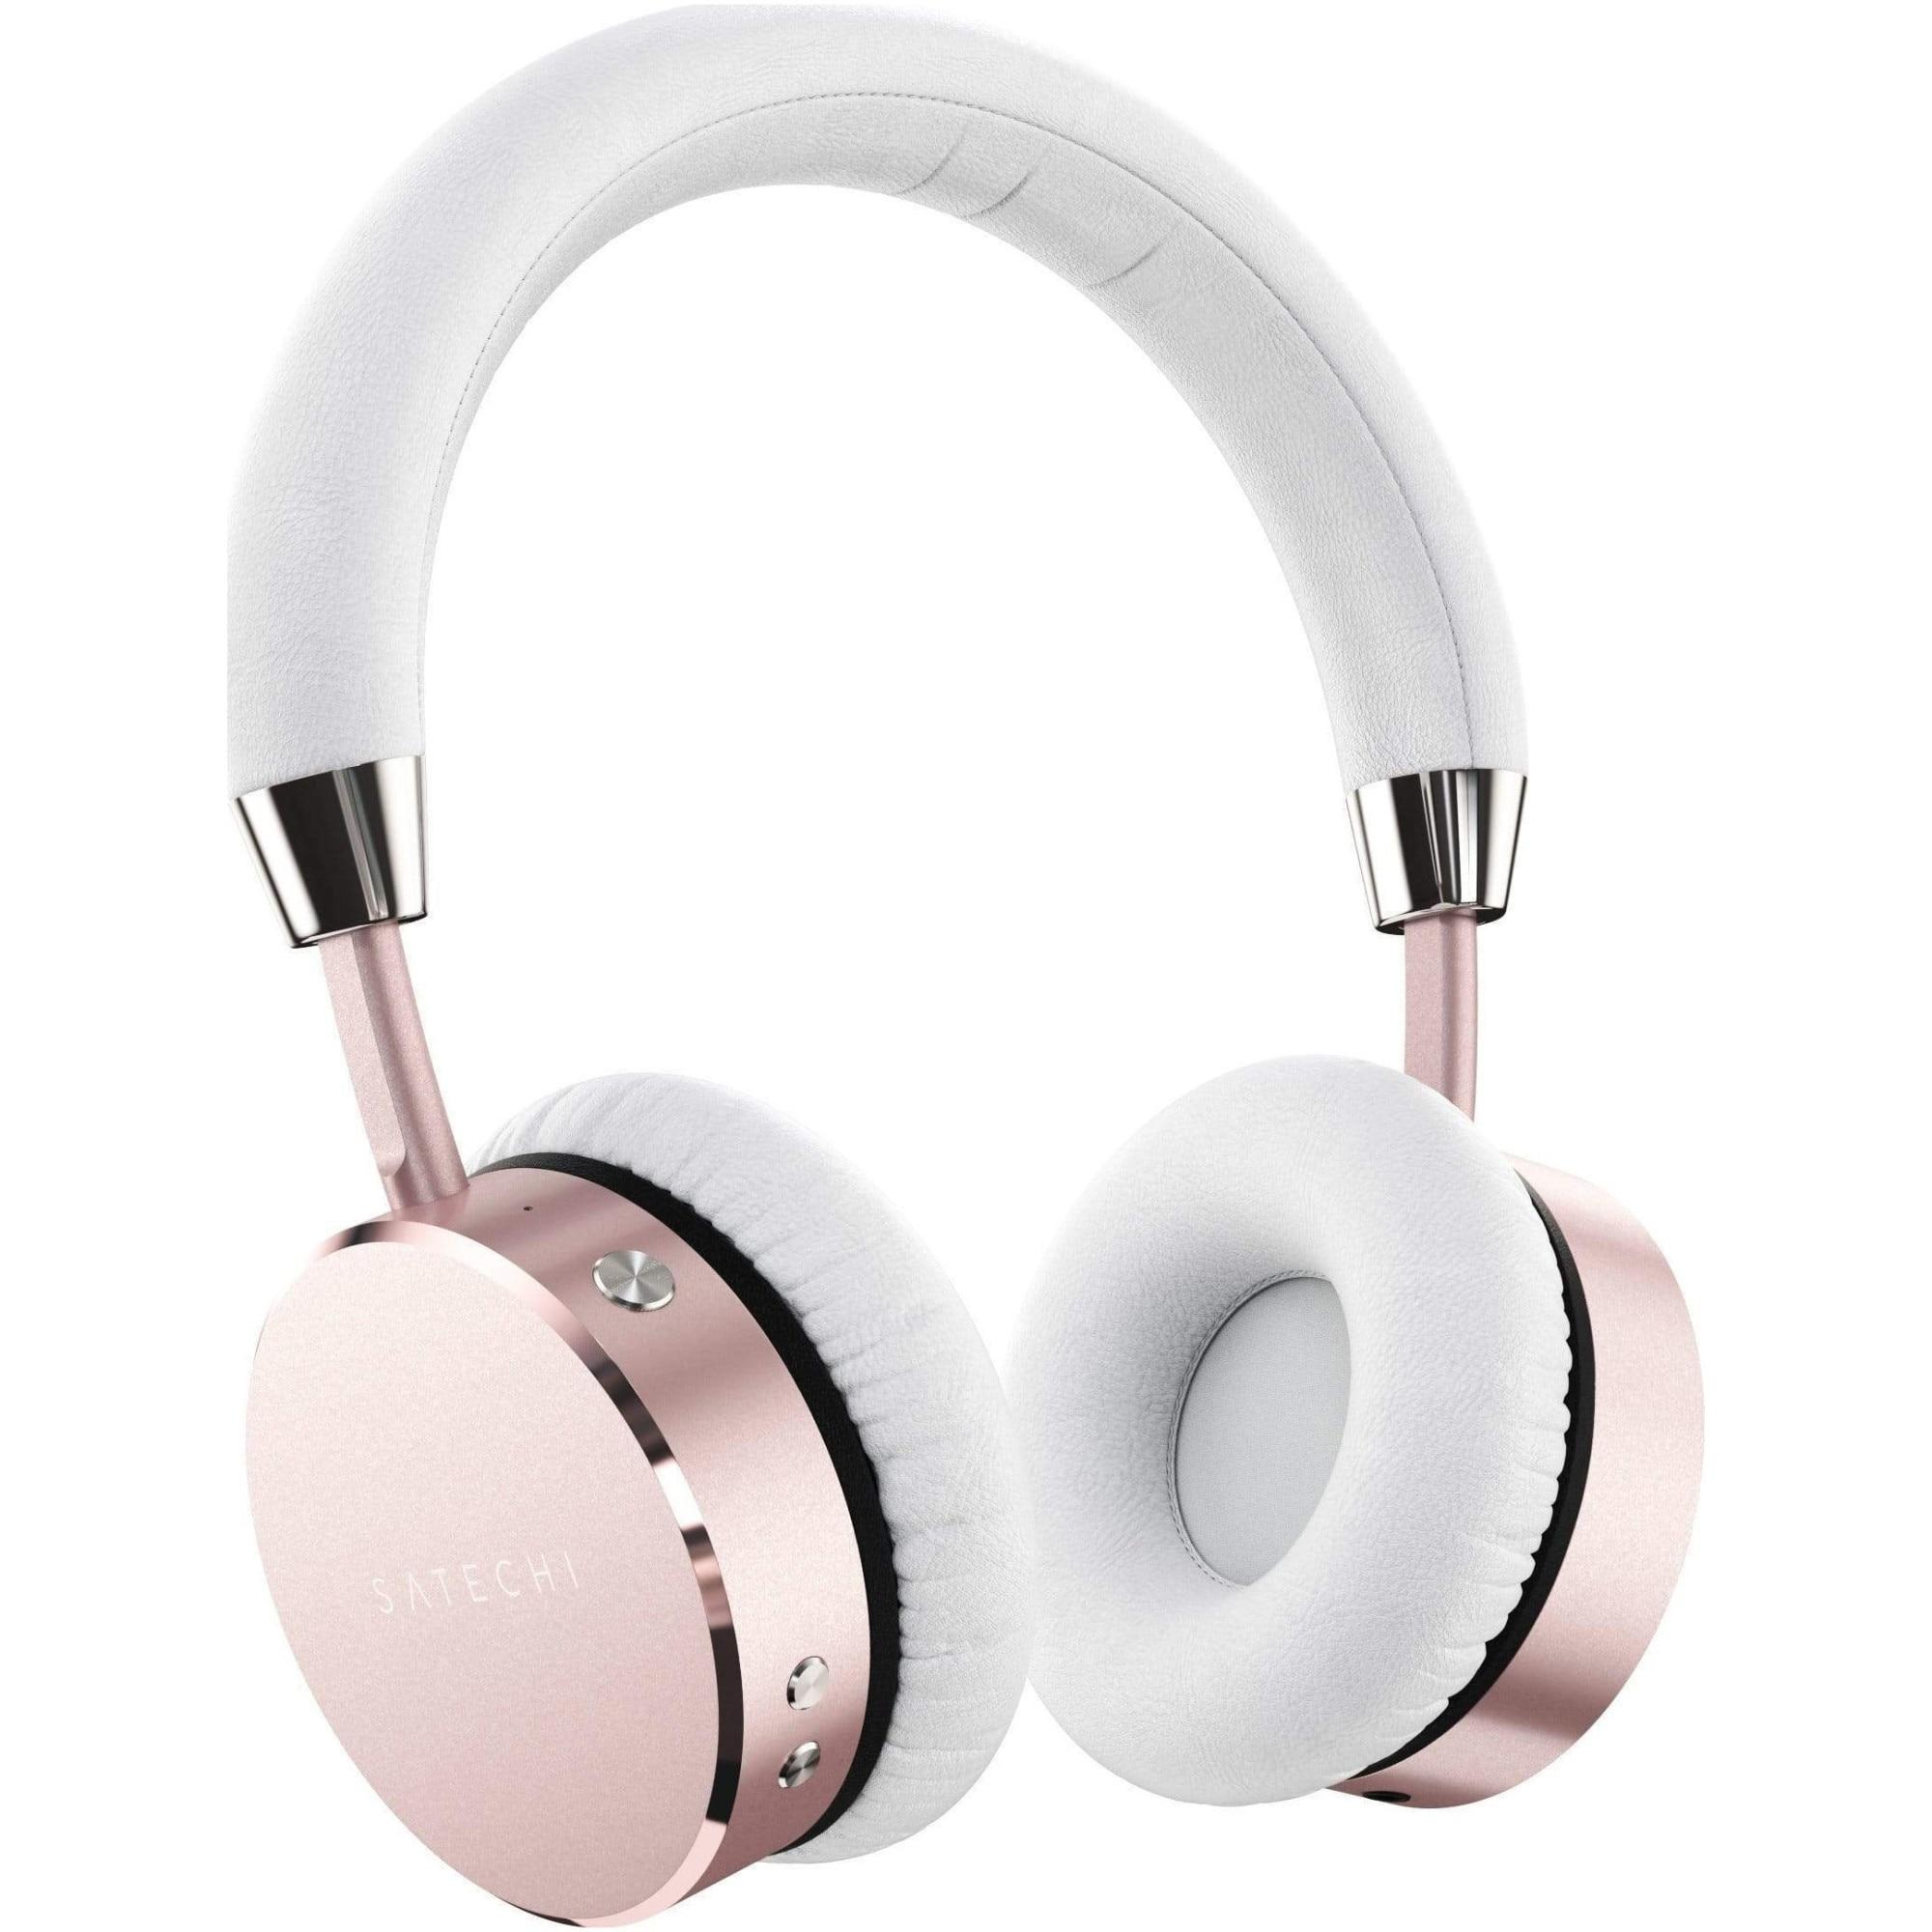 Fotografie Casti audio wireless, Satechi, aluminiu, Rose Gold